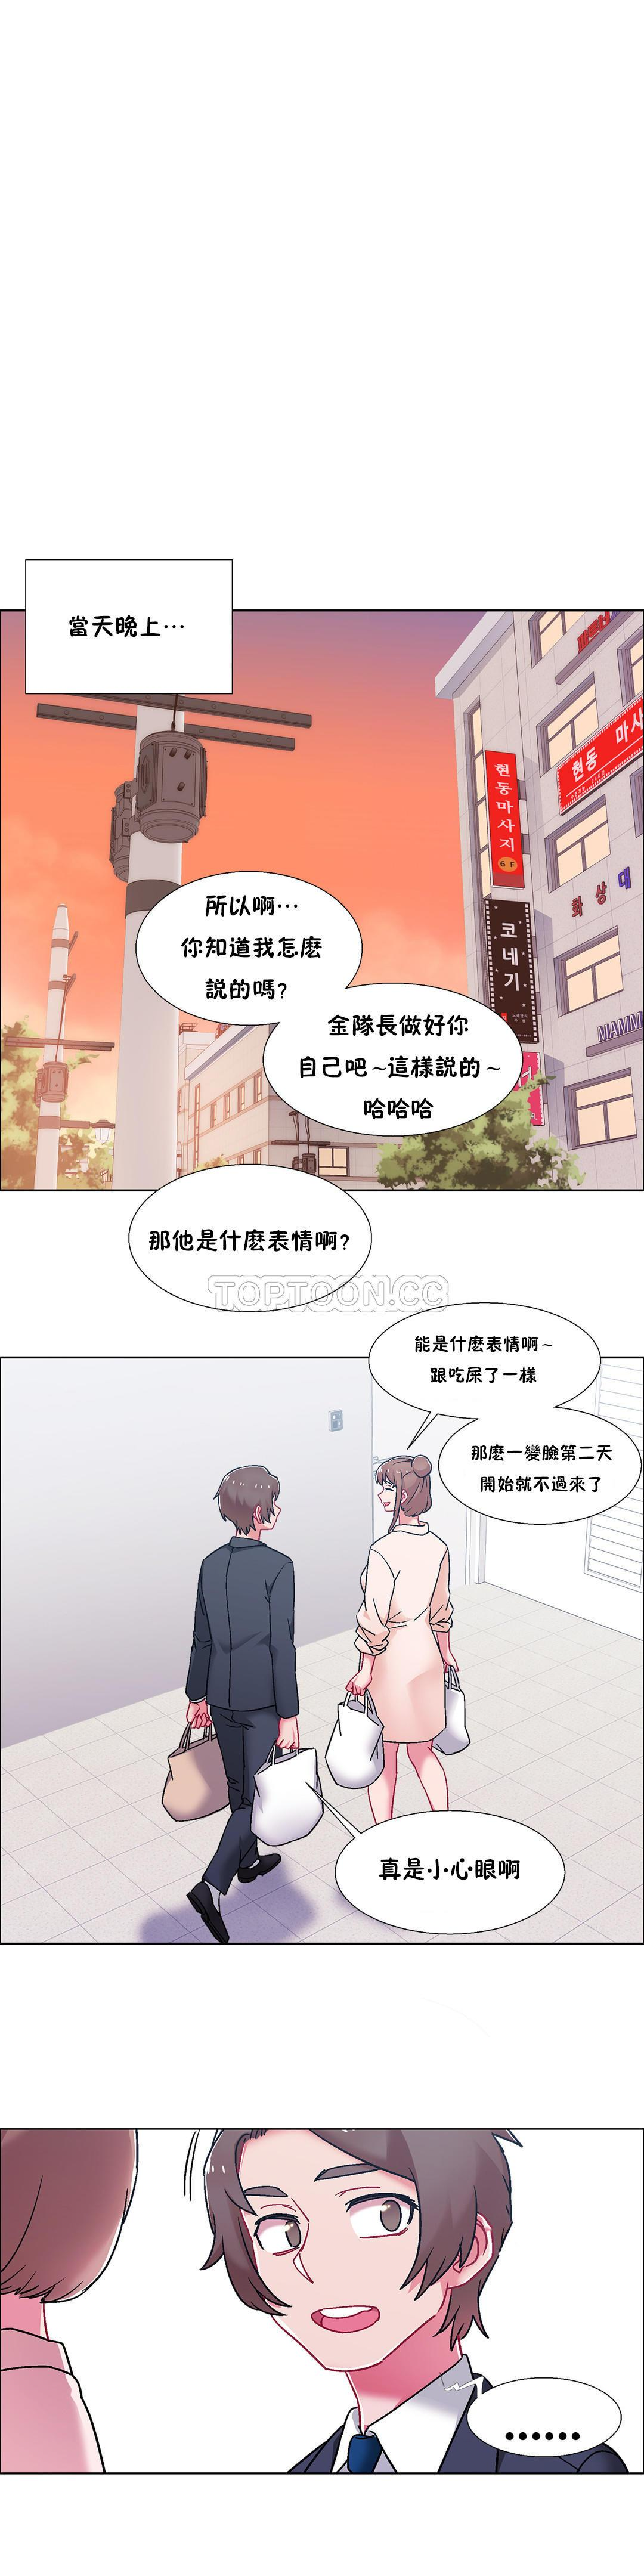 [Studio Wannabe] Rental Girls | 出租女郎 Ch. 33-58 [Chinese]  第二季 完结 439